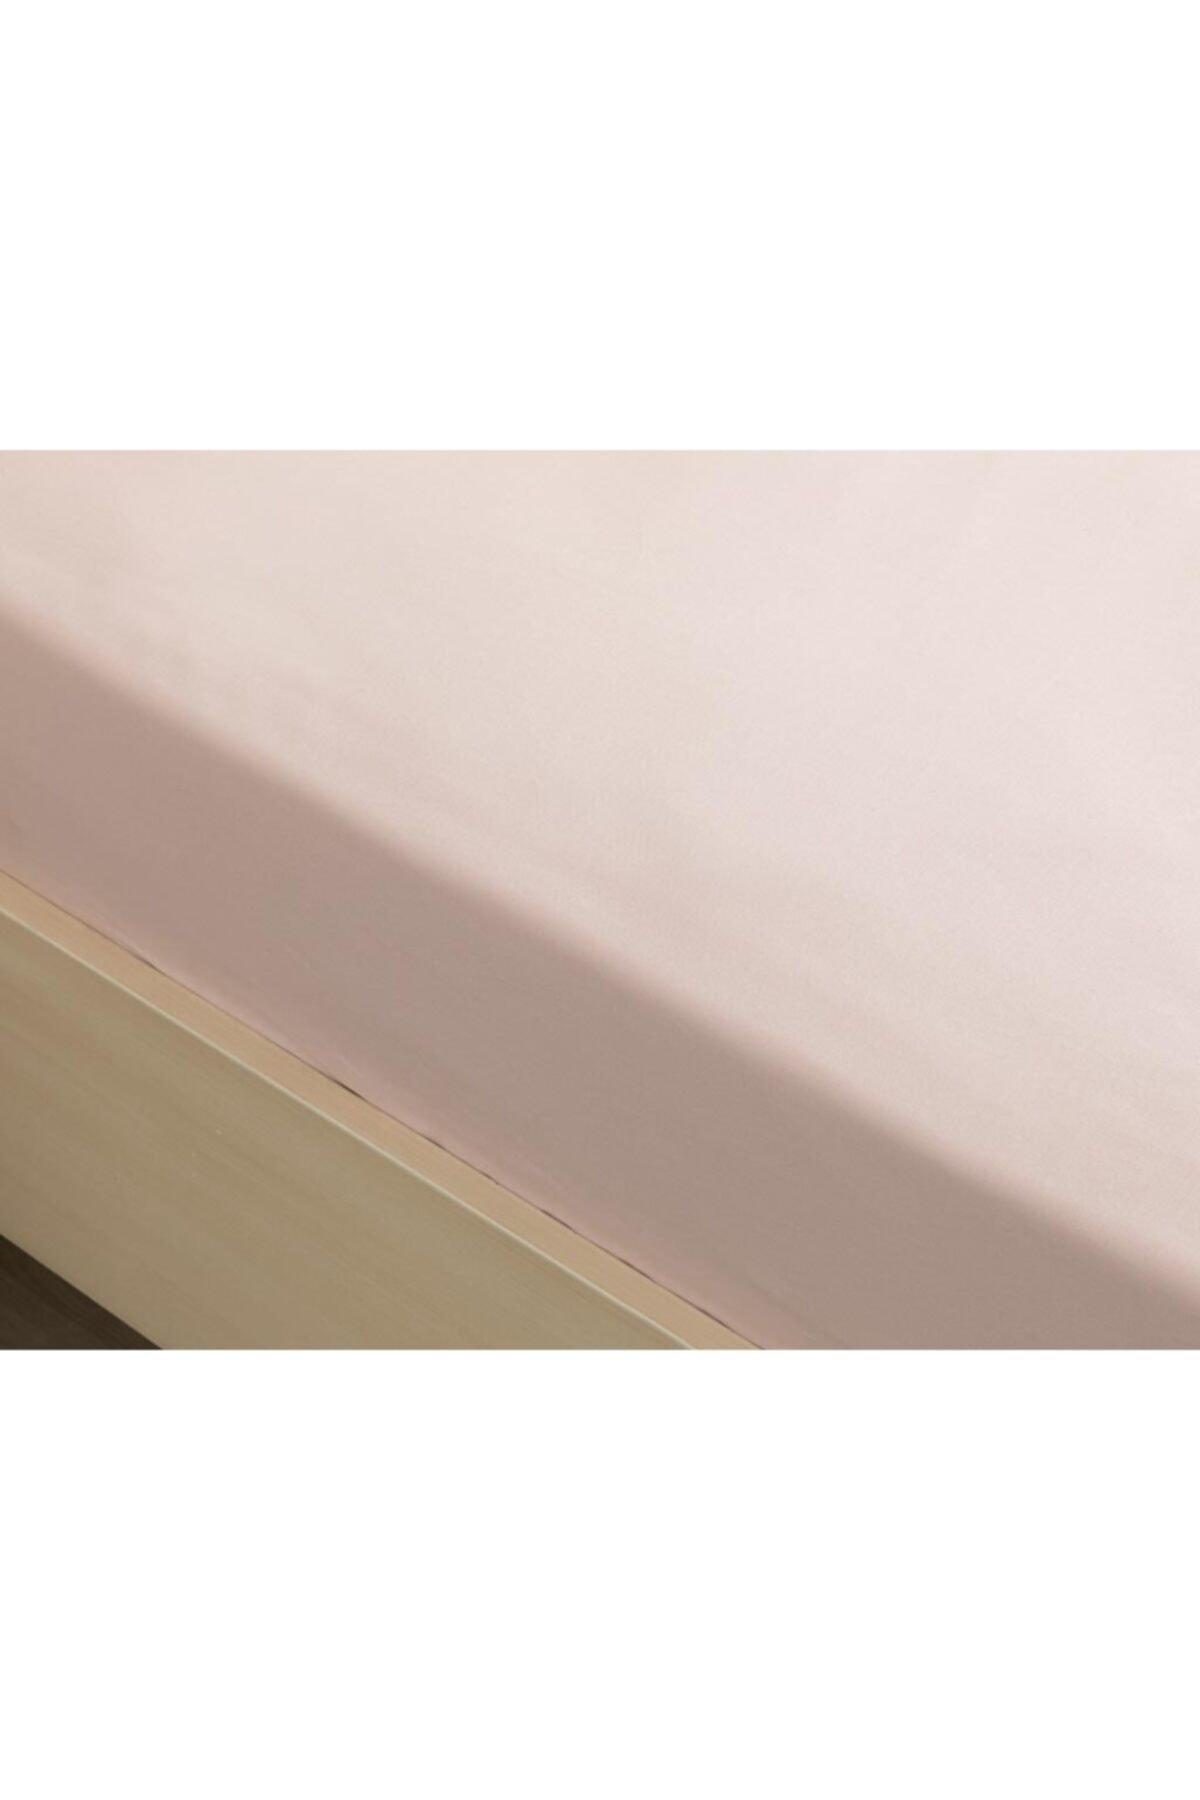 English Home Düz Pamuklu Çift Kişilik Lastikli Çarşaf 160x200 Cm Toz Pembe 2